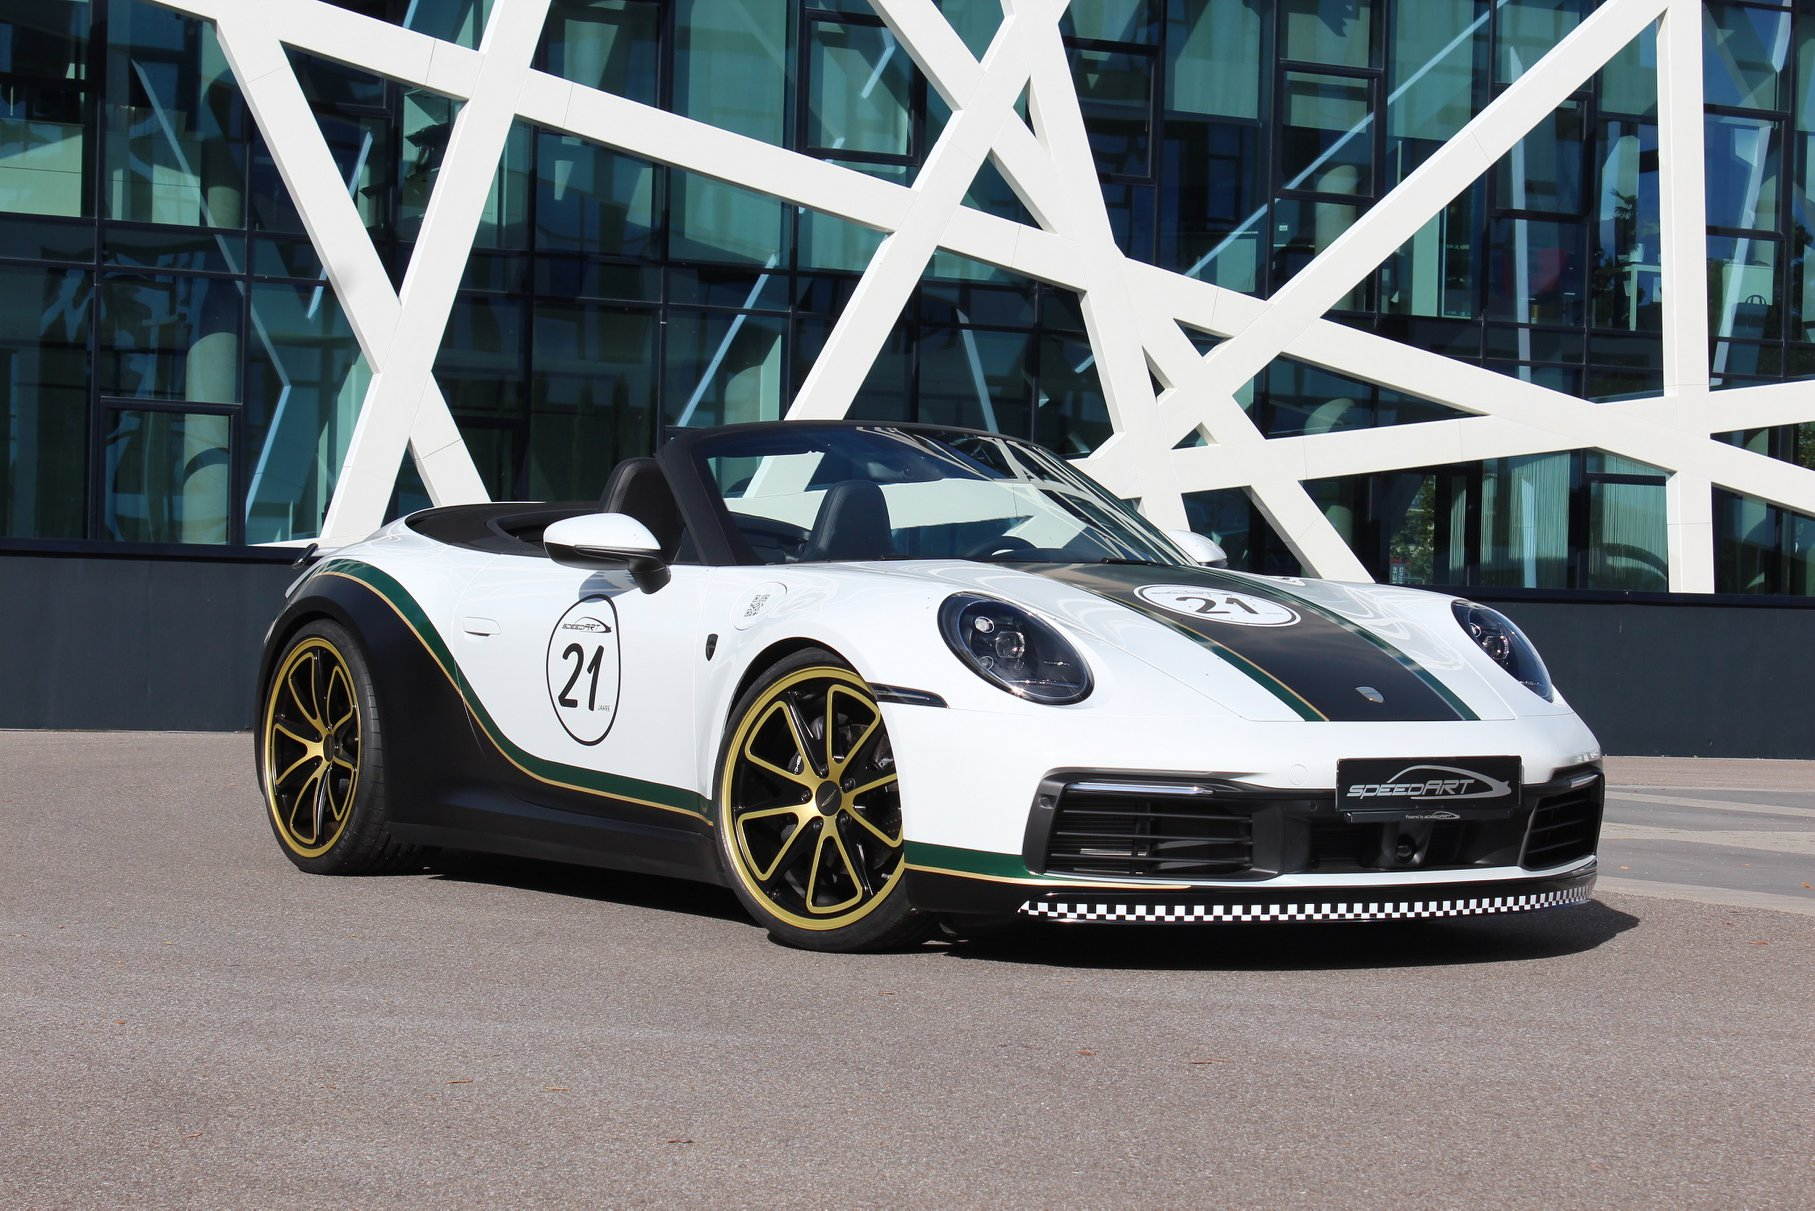 Porsche-911-by-Speedart-1